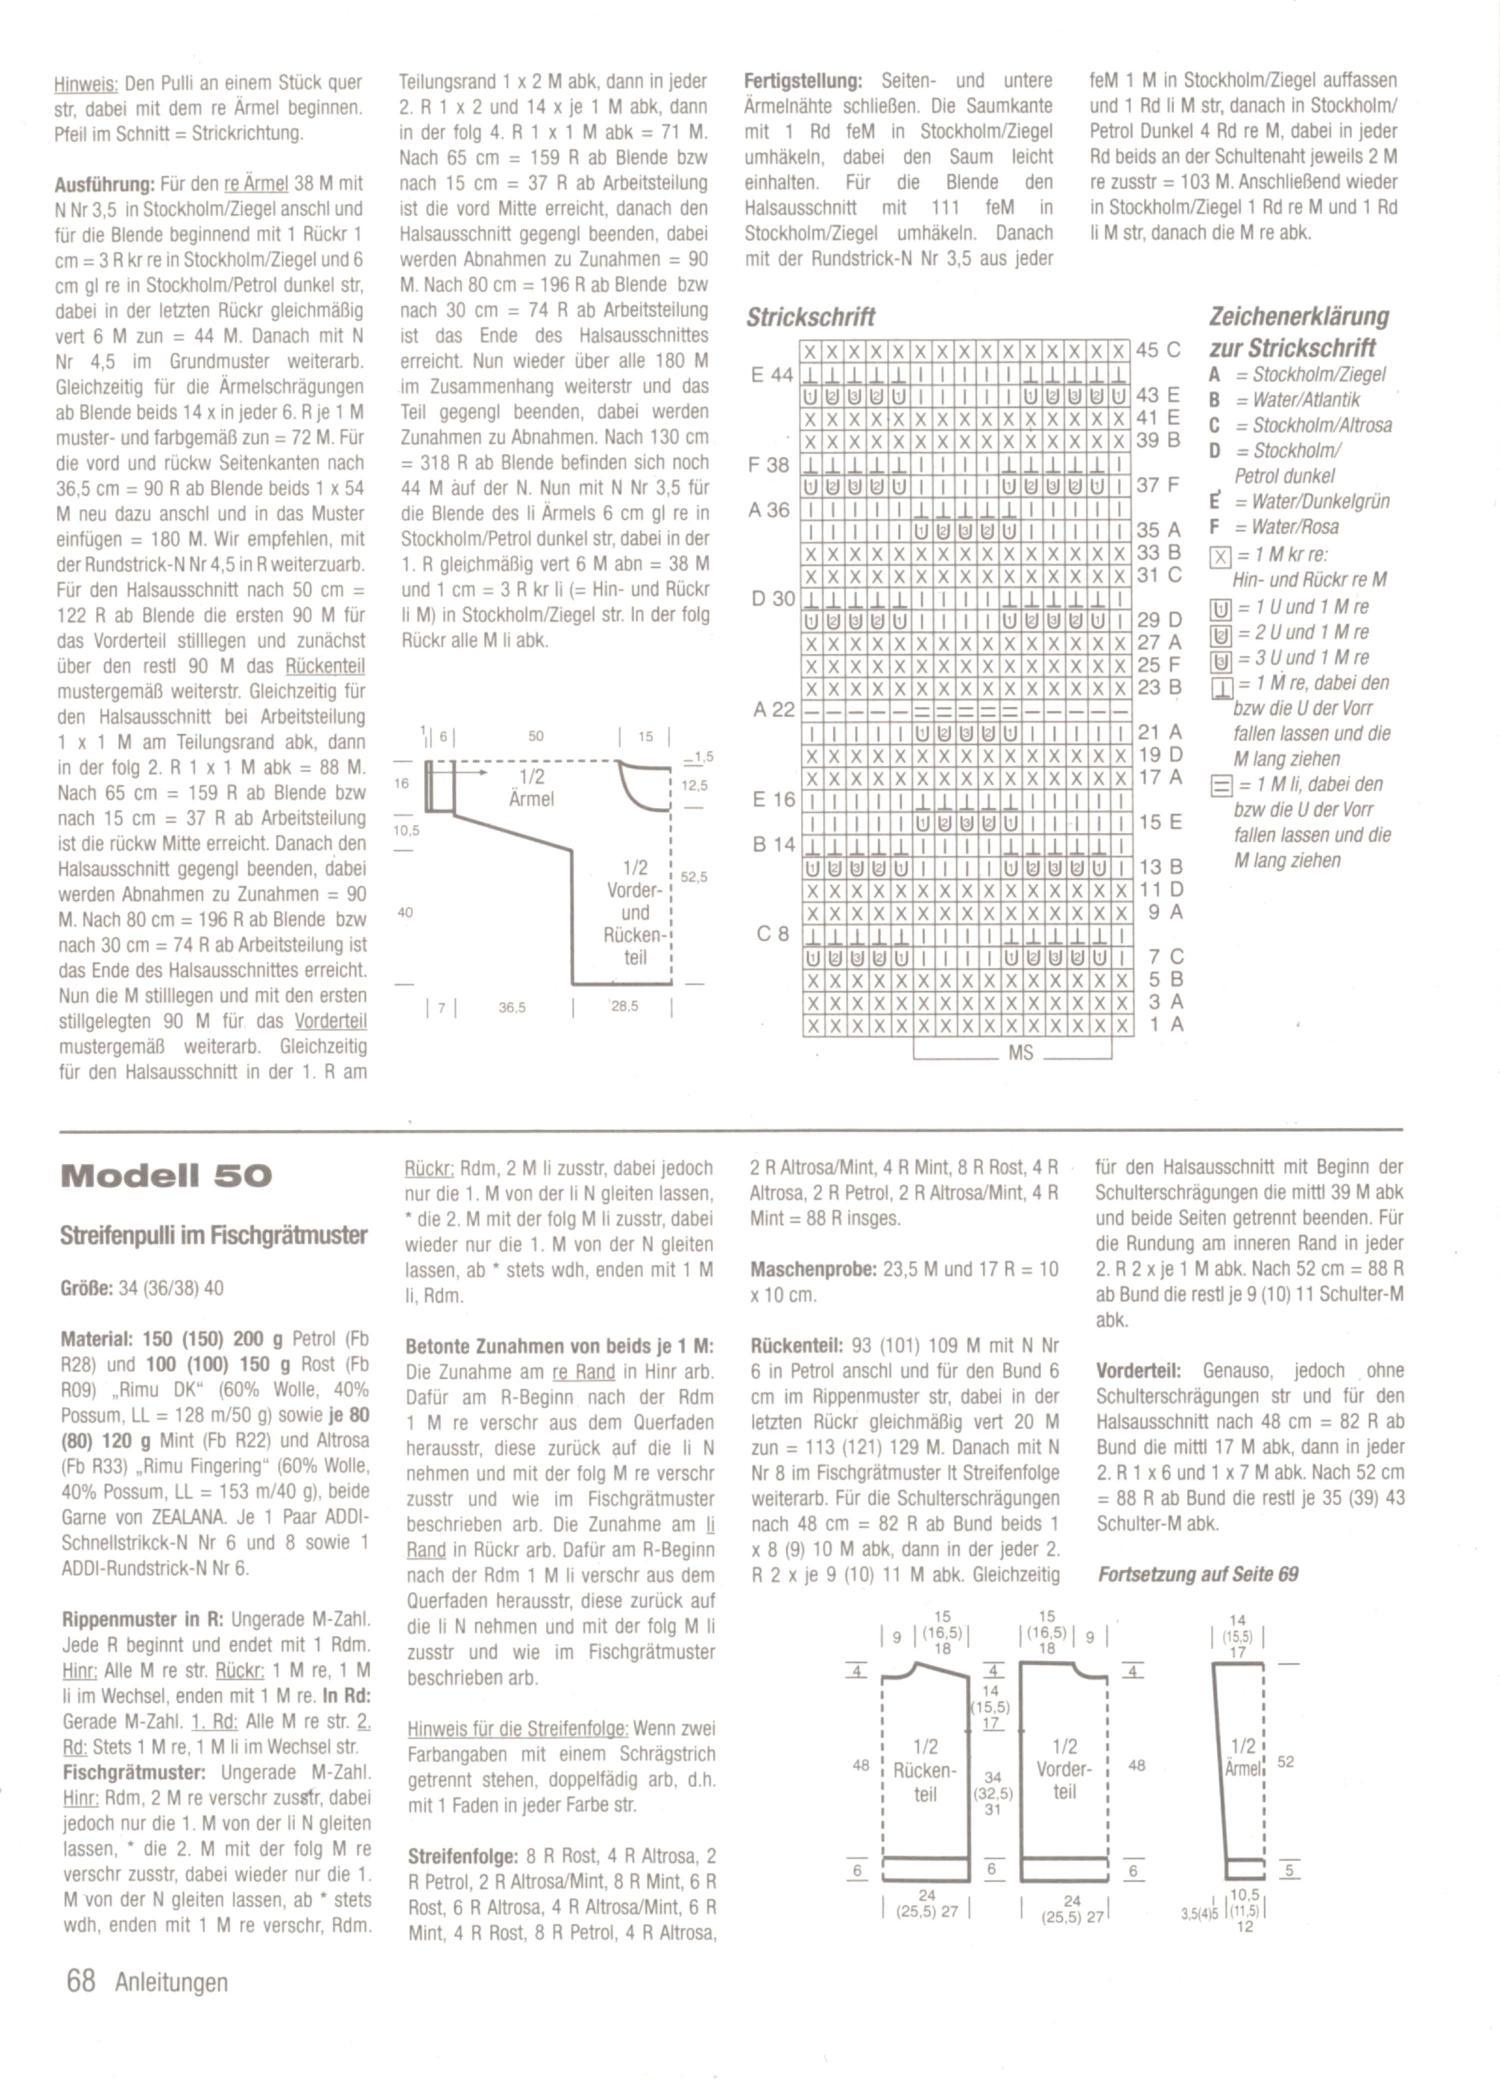 Page_00068.jpg